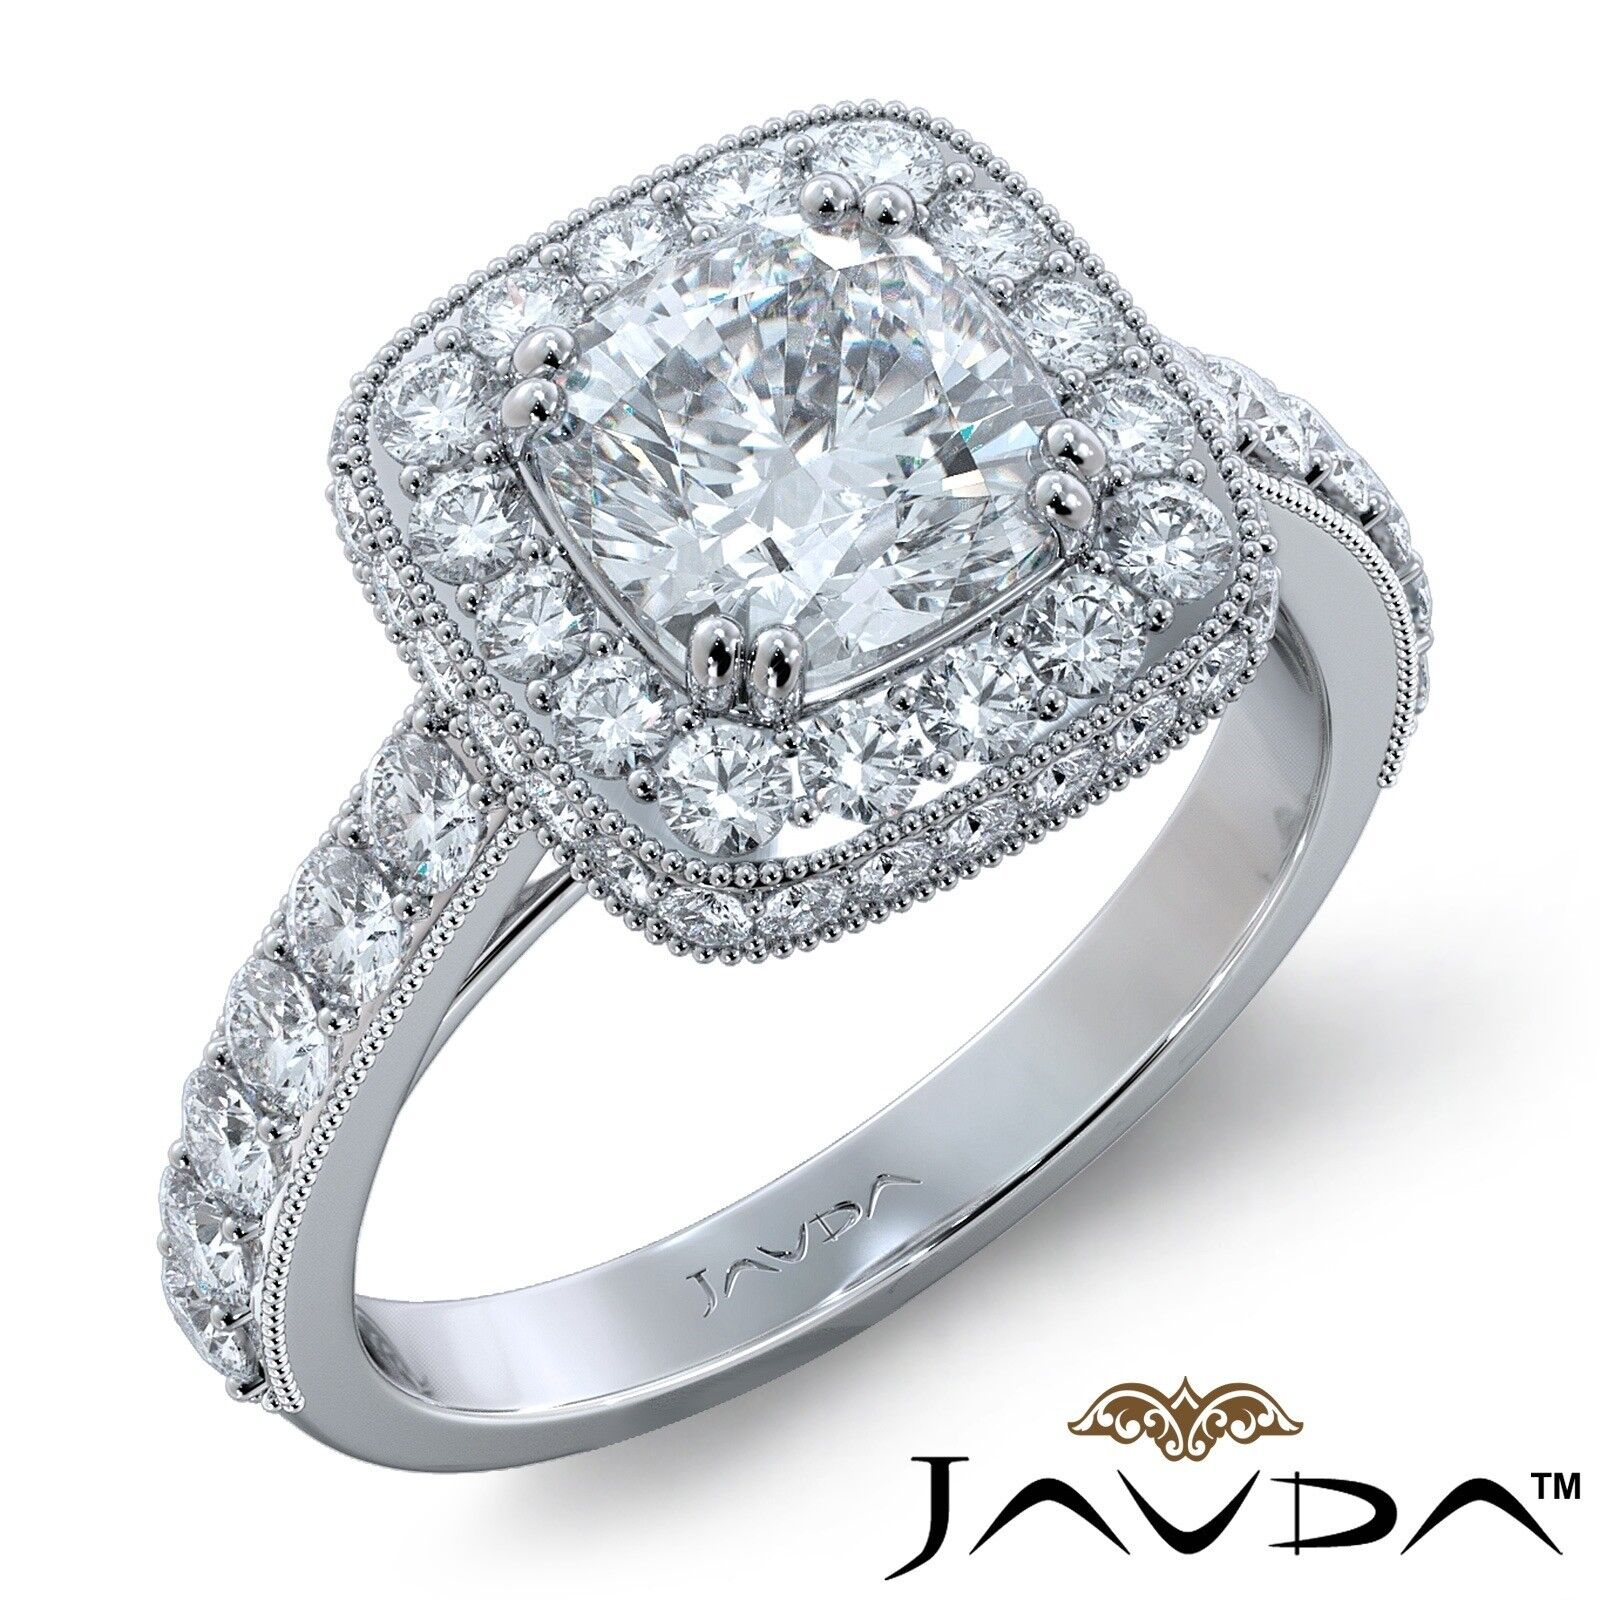 1.9ct Milgrain Halo Floral Basket Cushion Diamond Engagement Ring GIA H-VS2 Gold